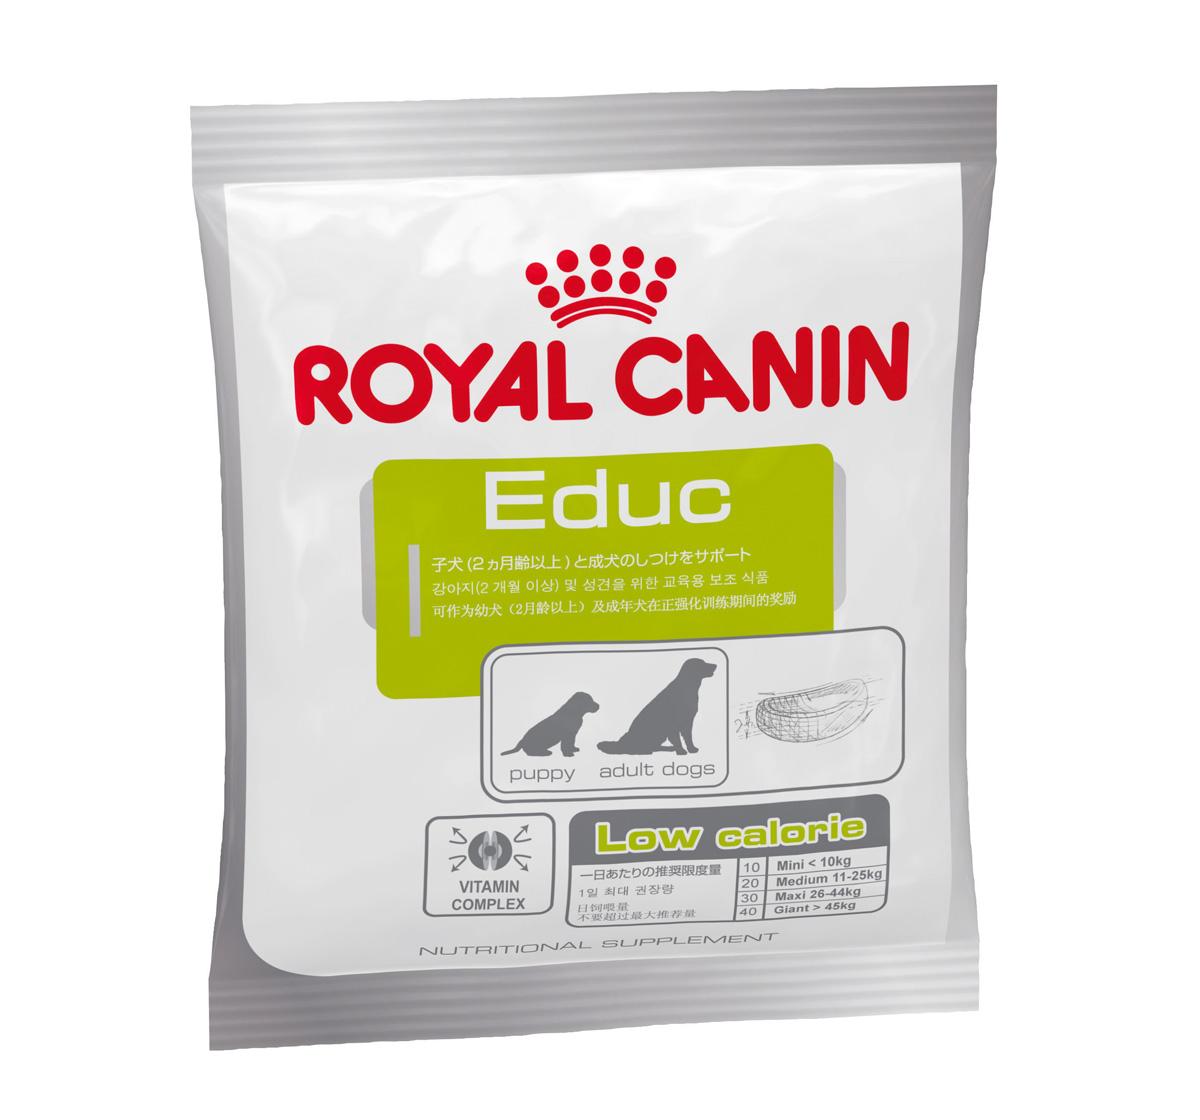 royal canin educ 50 gms dogspot online pet supply store. Black Bedroom Furniture Sets. Home Design Ideas